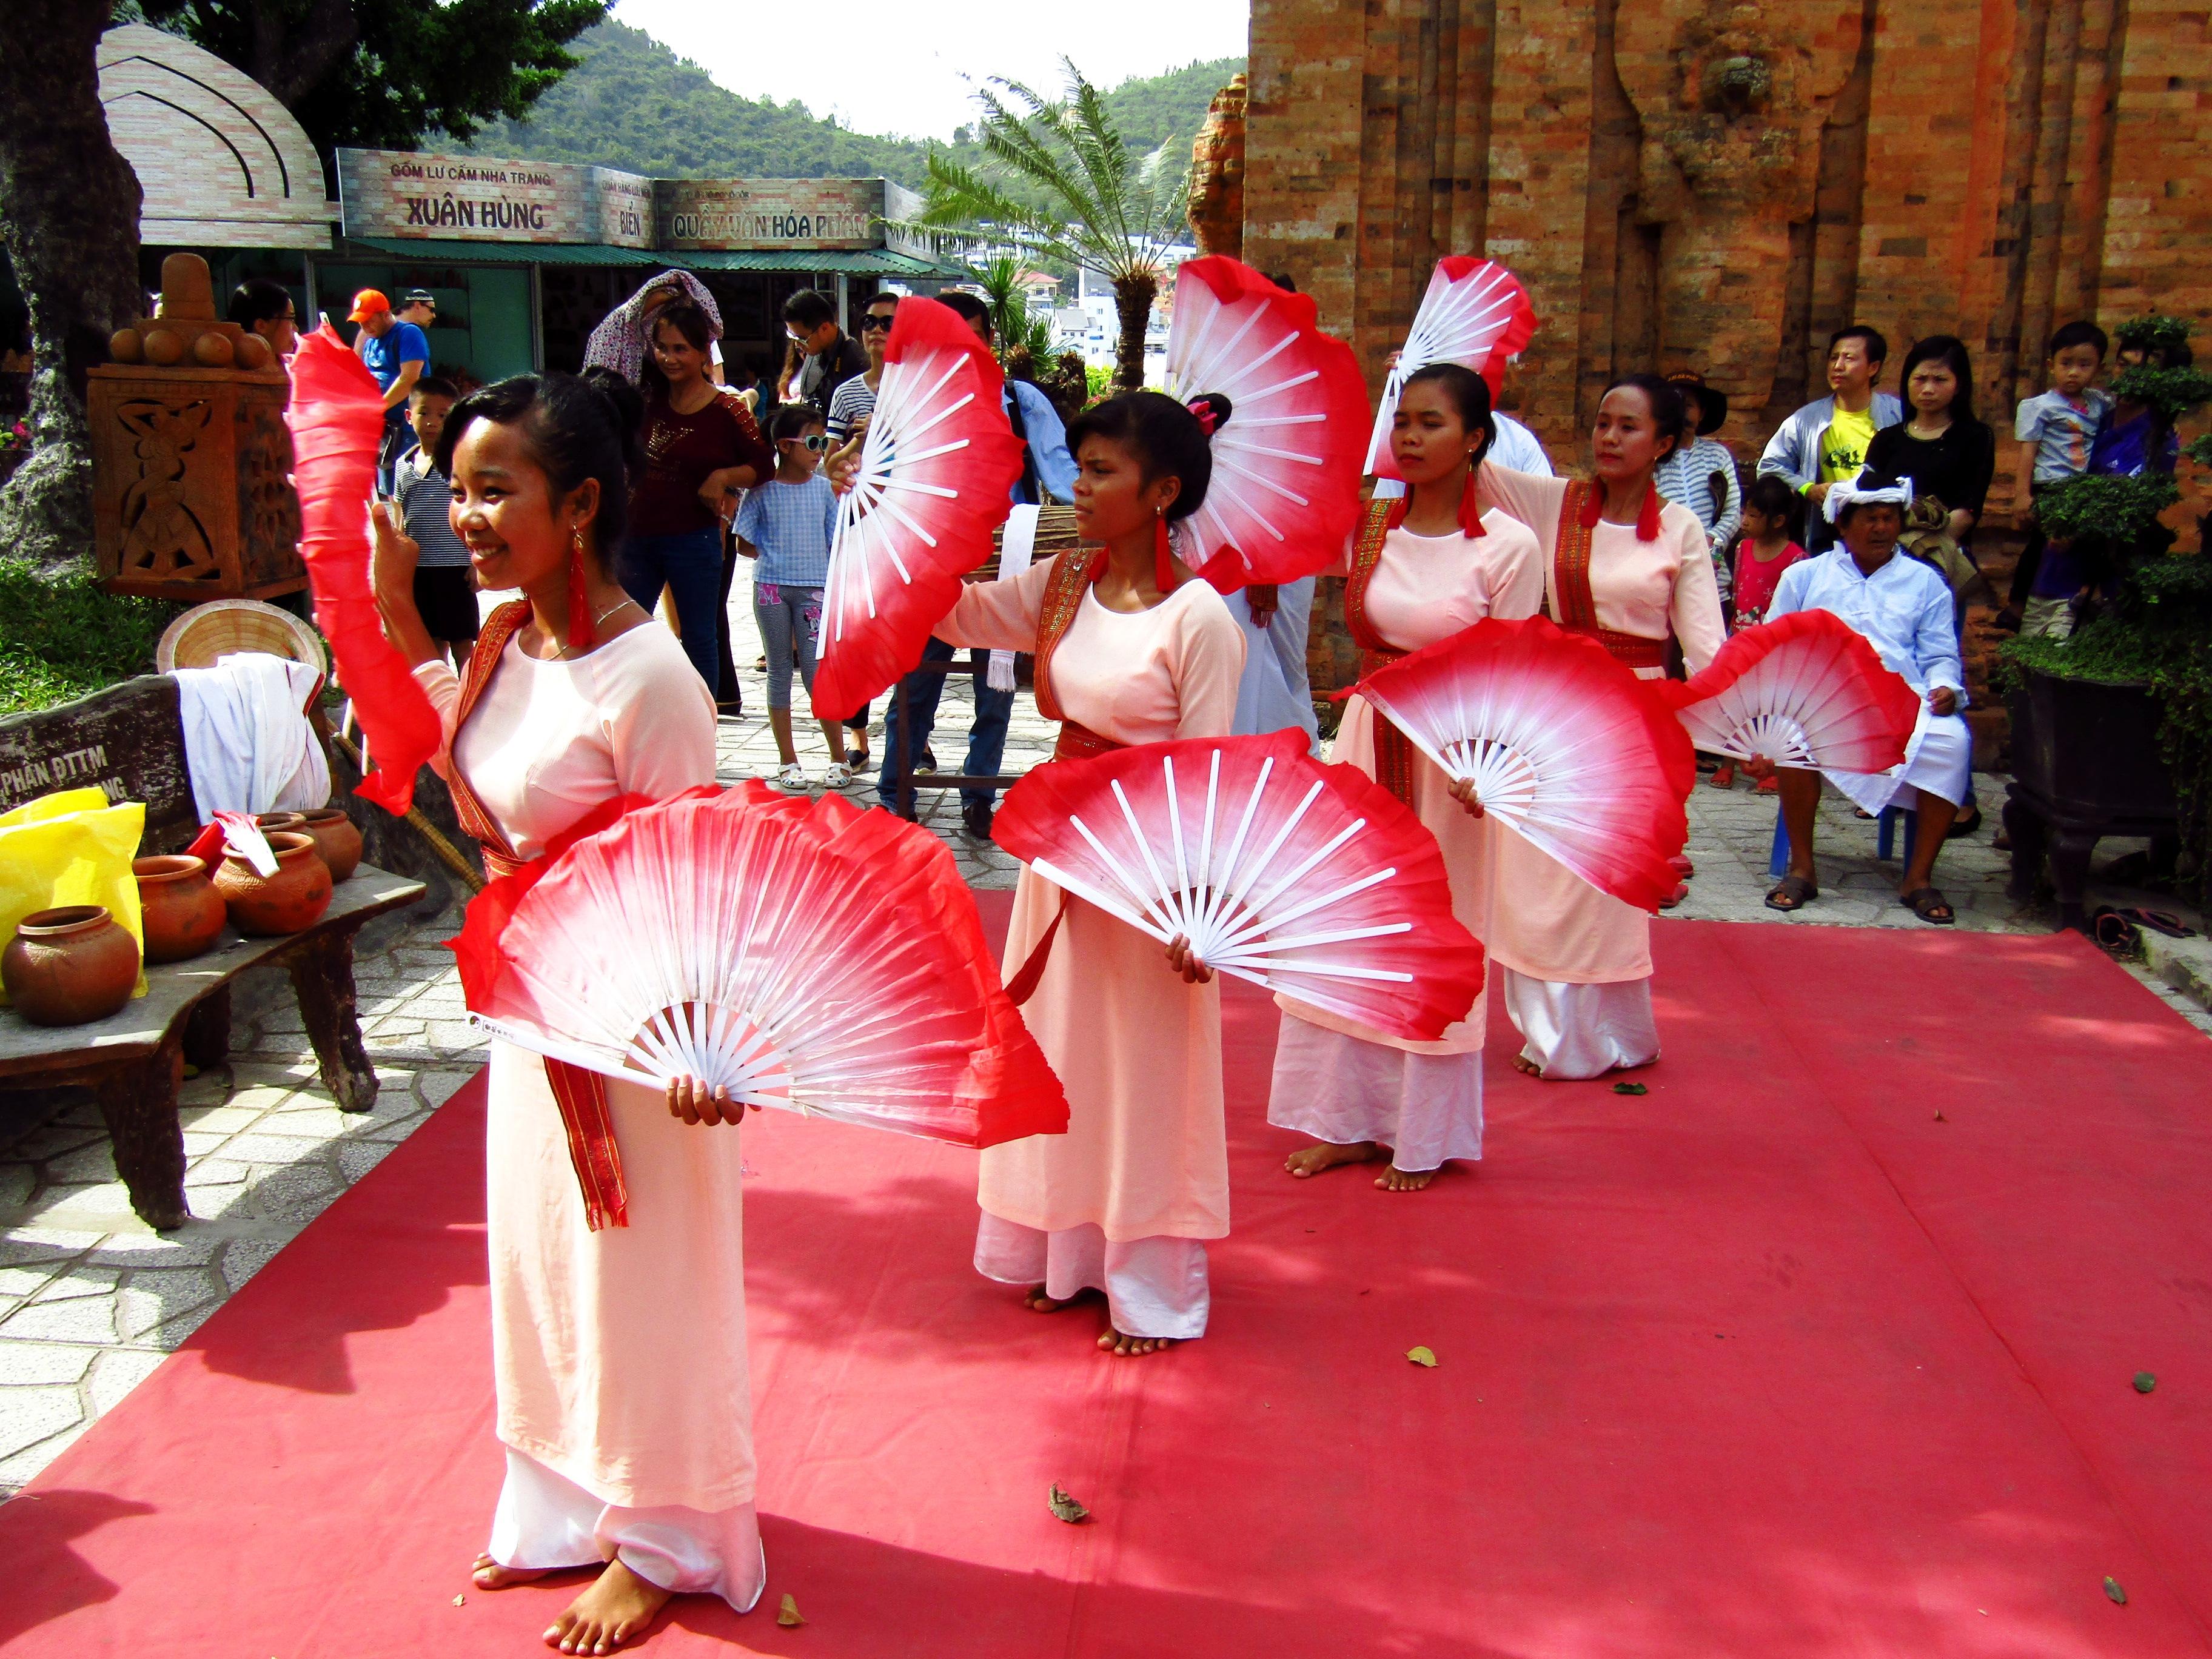 Stumbling upon a dance performance in Nha Trang